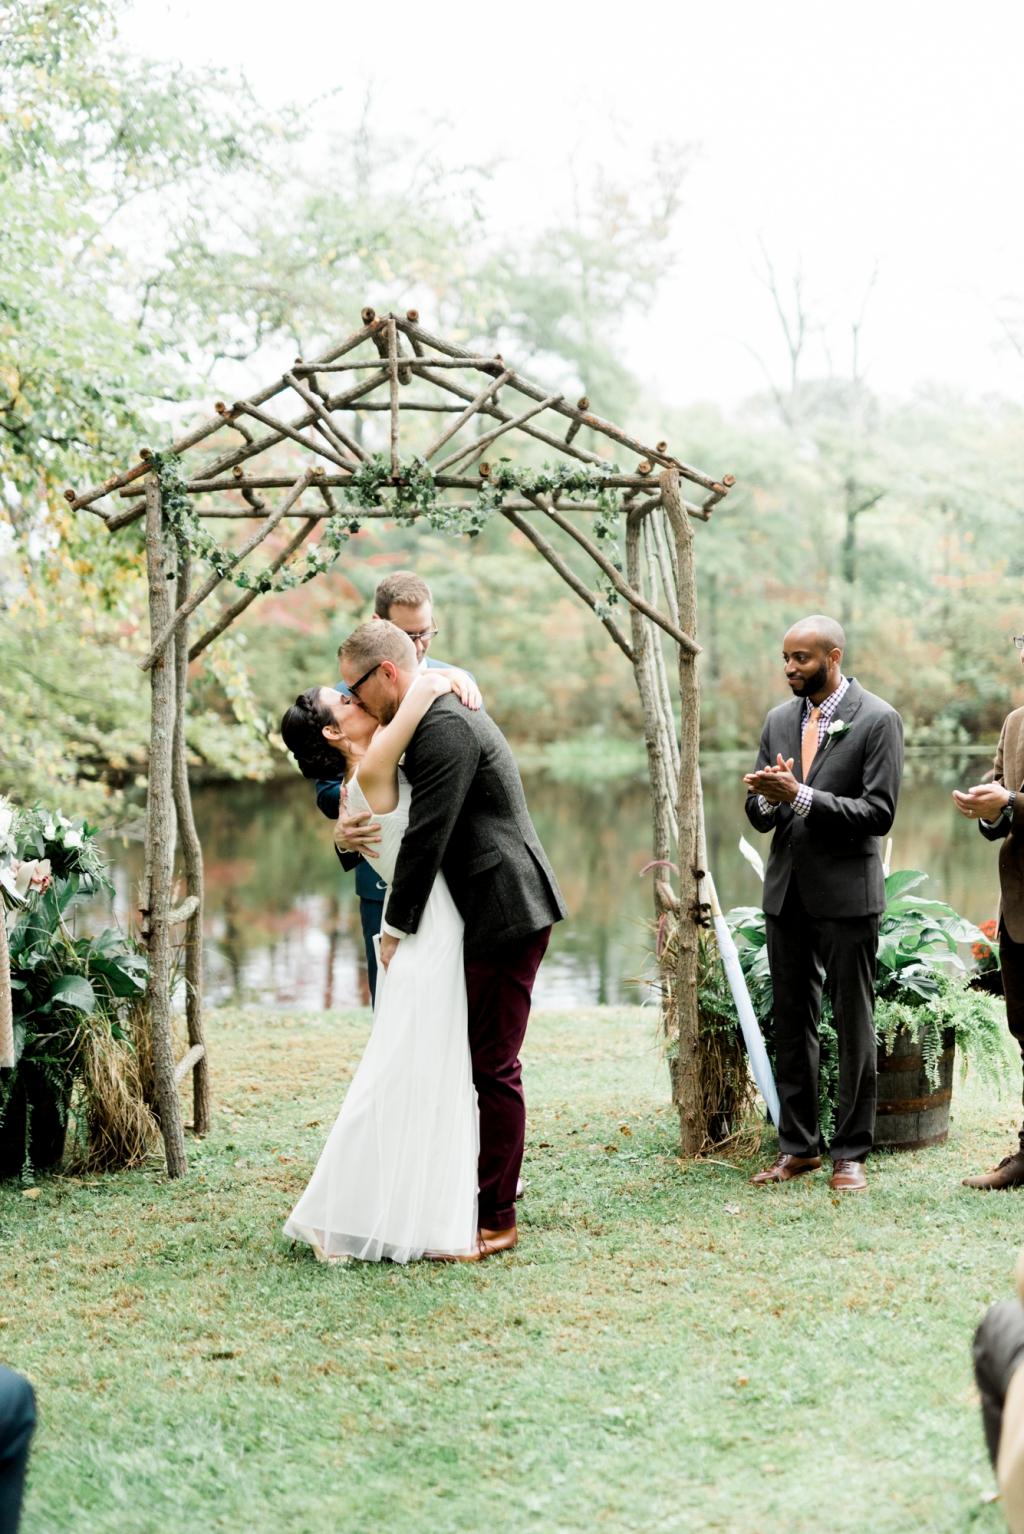 haley-richter-photography-new-jersey-backyard-wedding-060